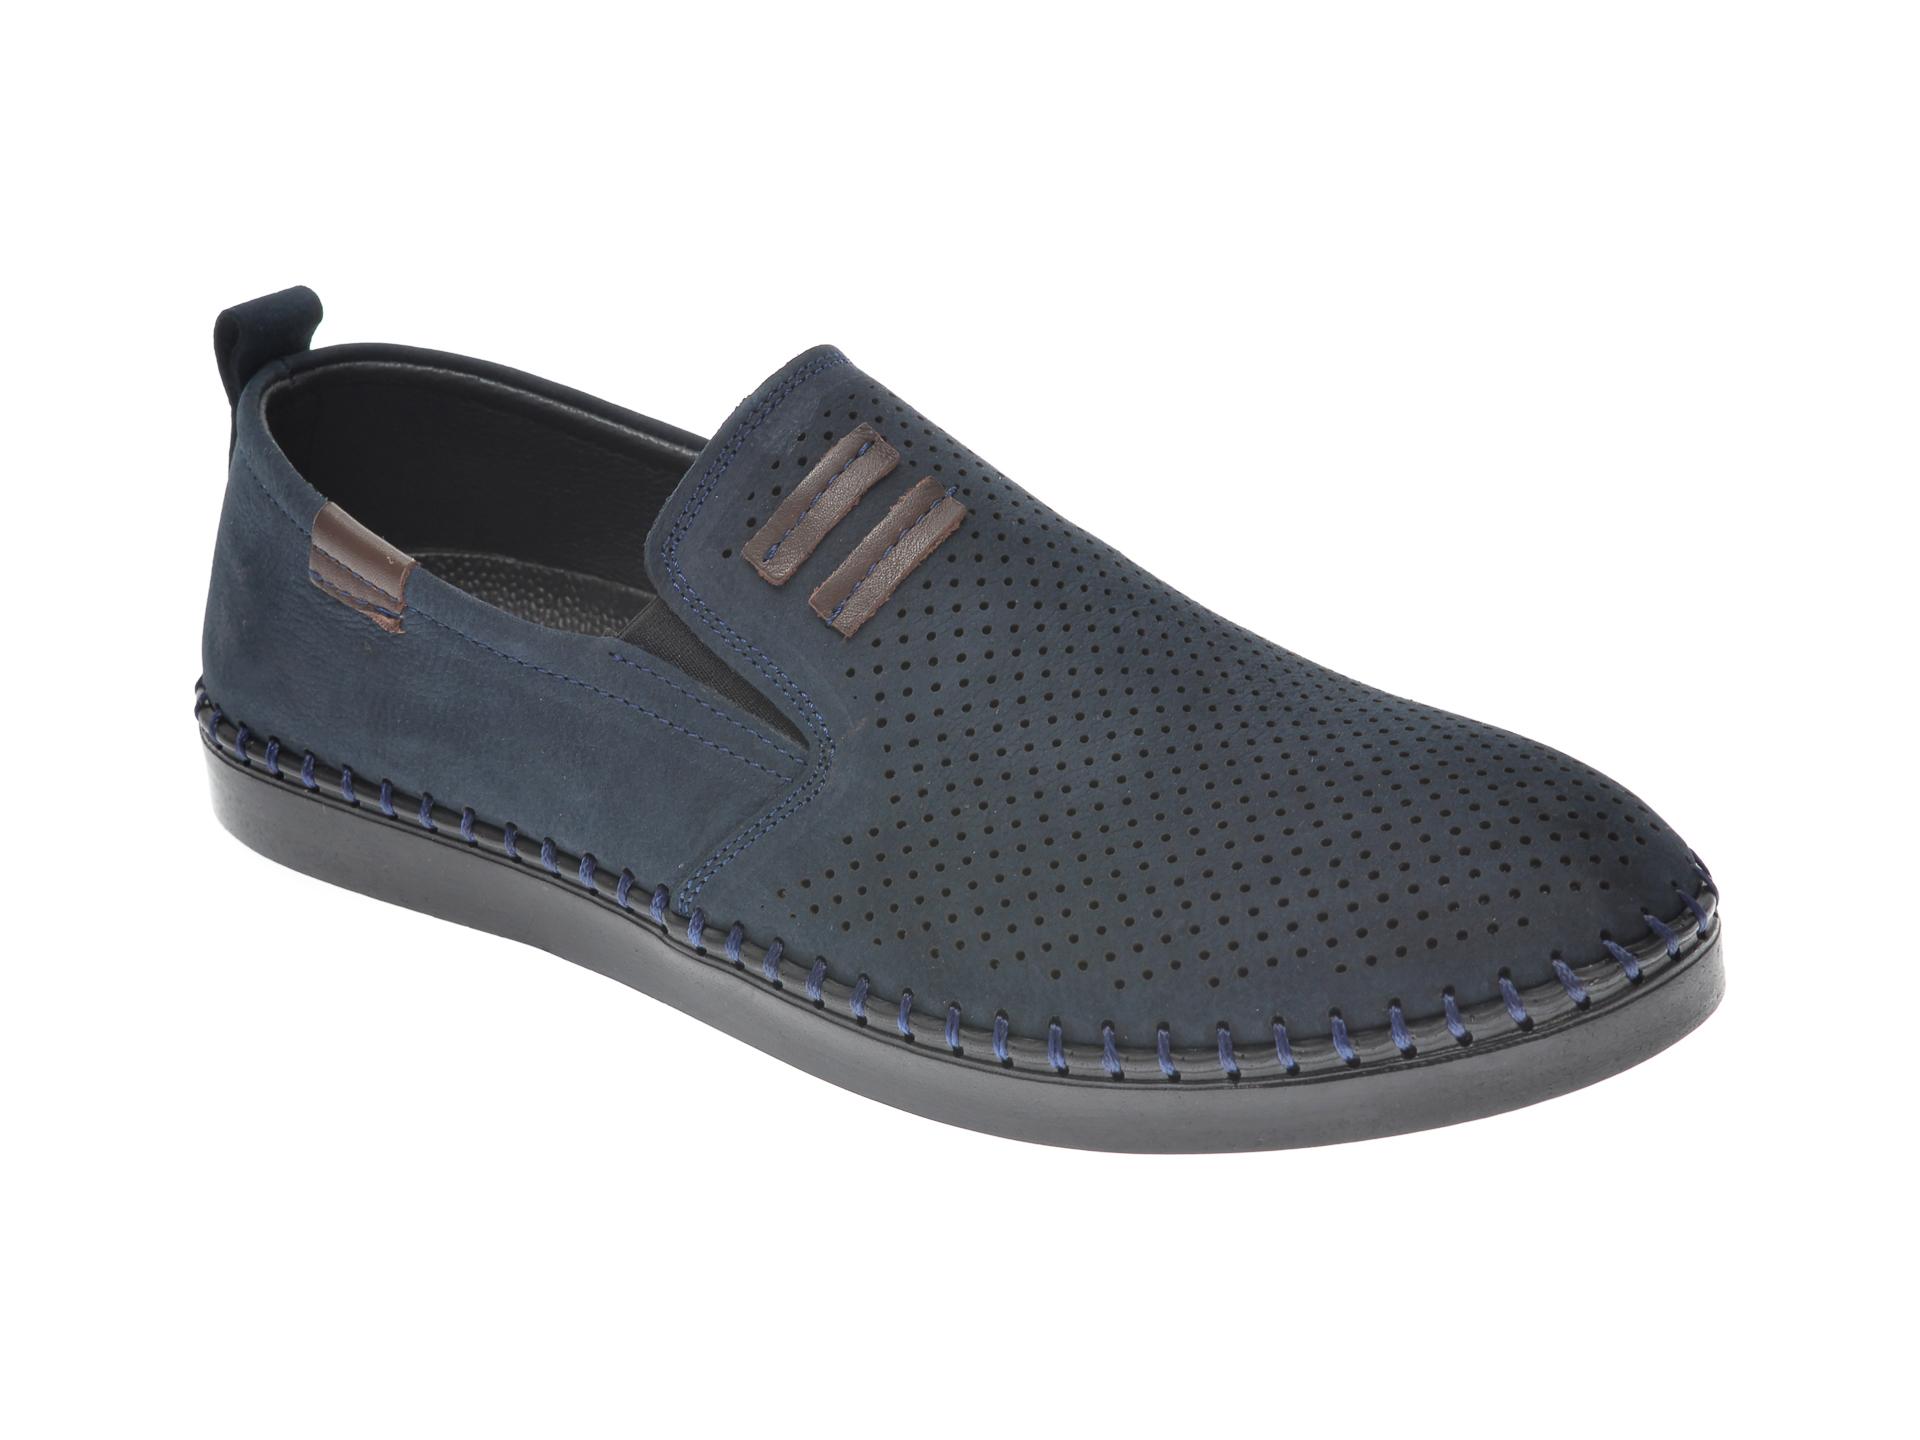 Pantofi OTTER bleumarin, 2870, din nabuc New